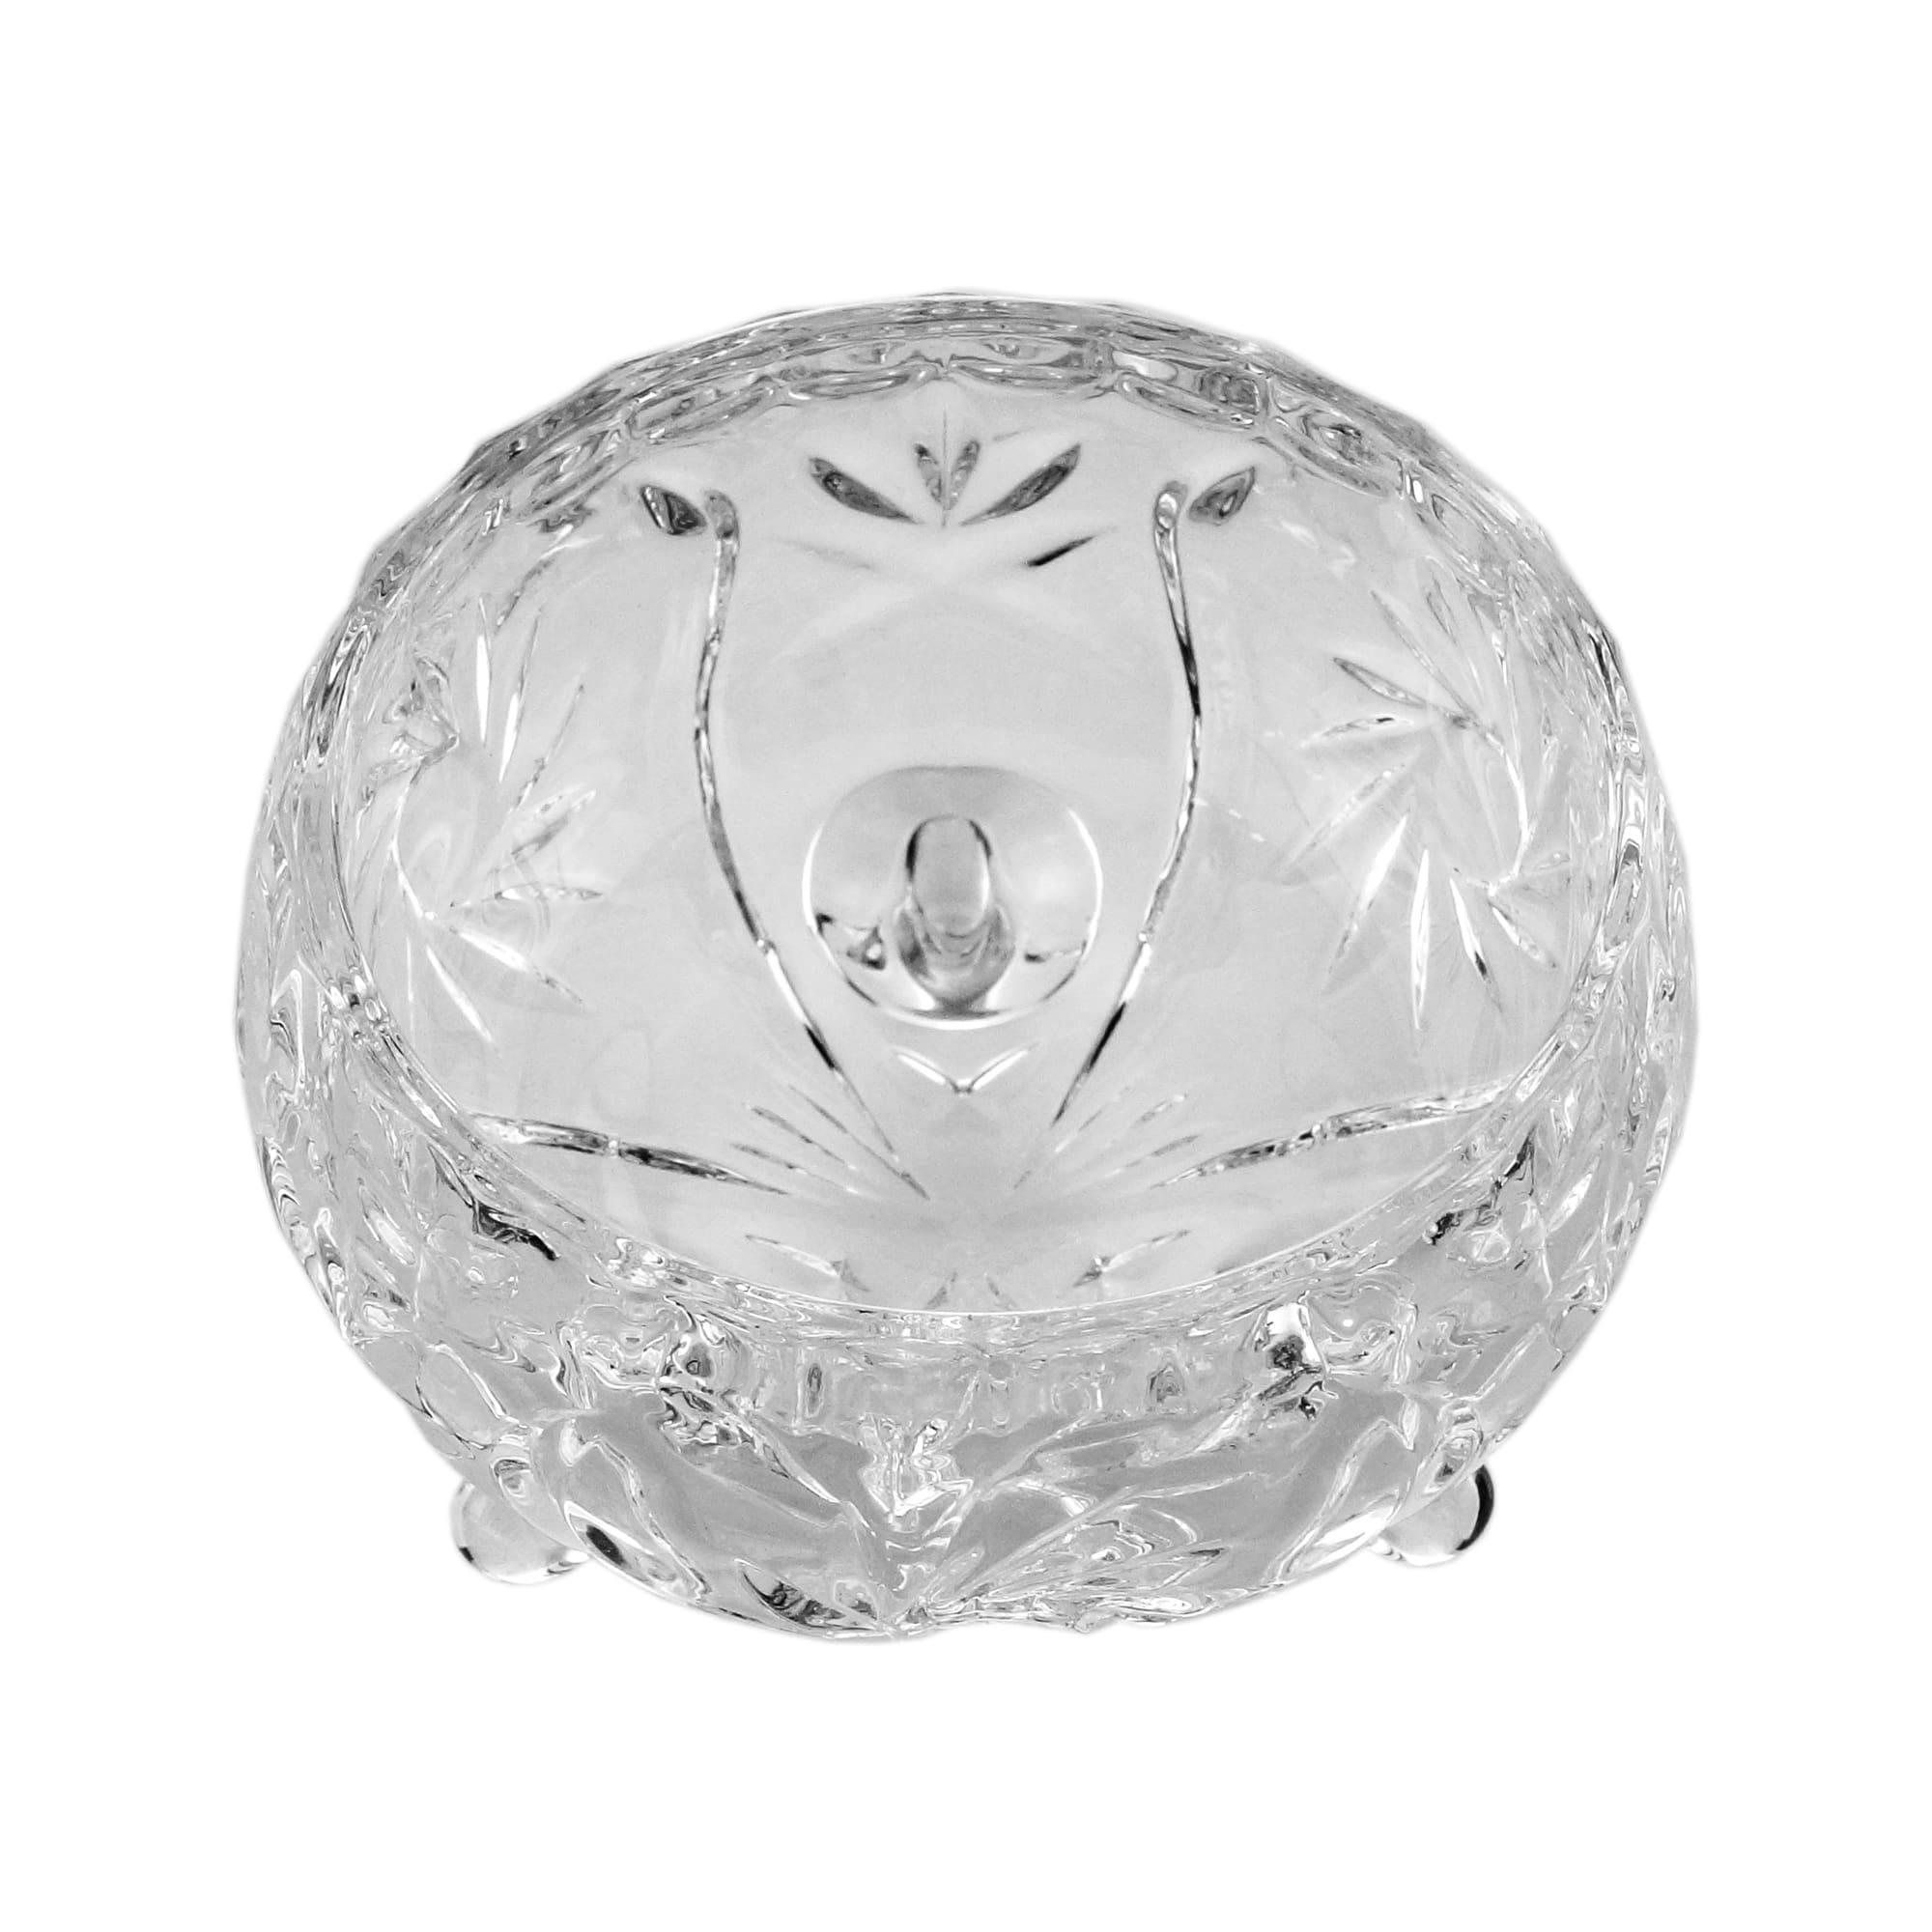 Conjunto com 4 Bowls de Cristal de Chumbo Prima 8 x 5,5cm